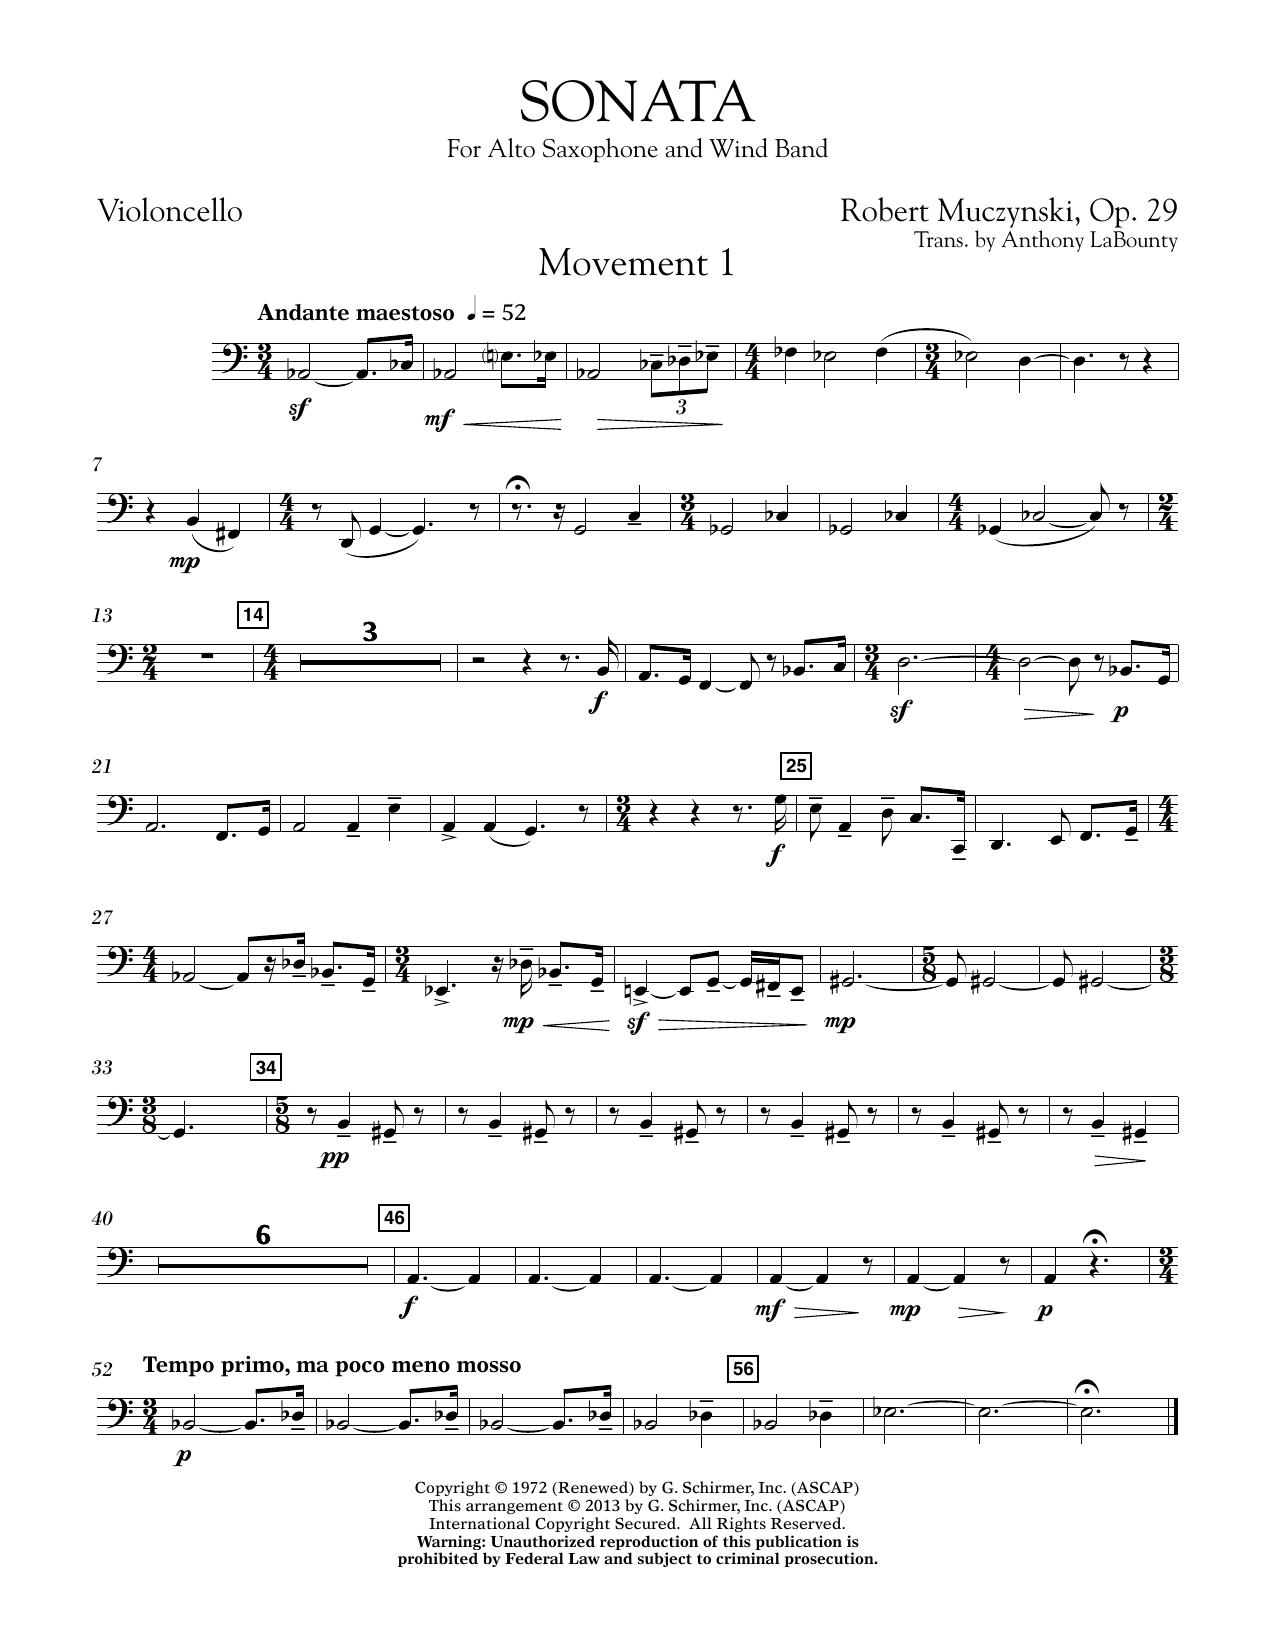 Sonata for Alto Saxophone, Op. 29 - Violincello (Concert Band)